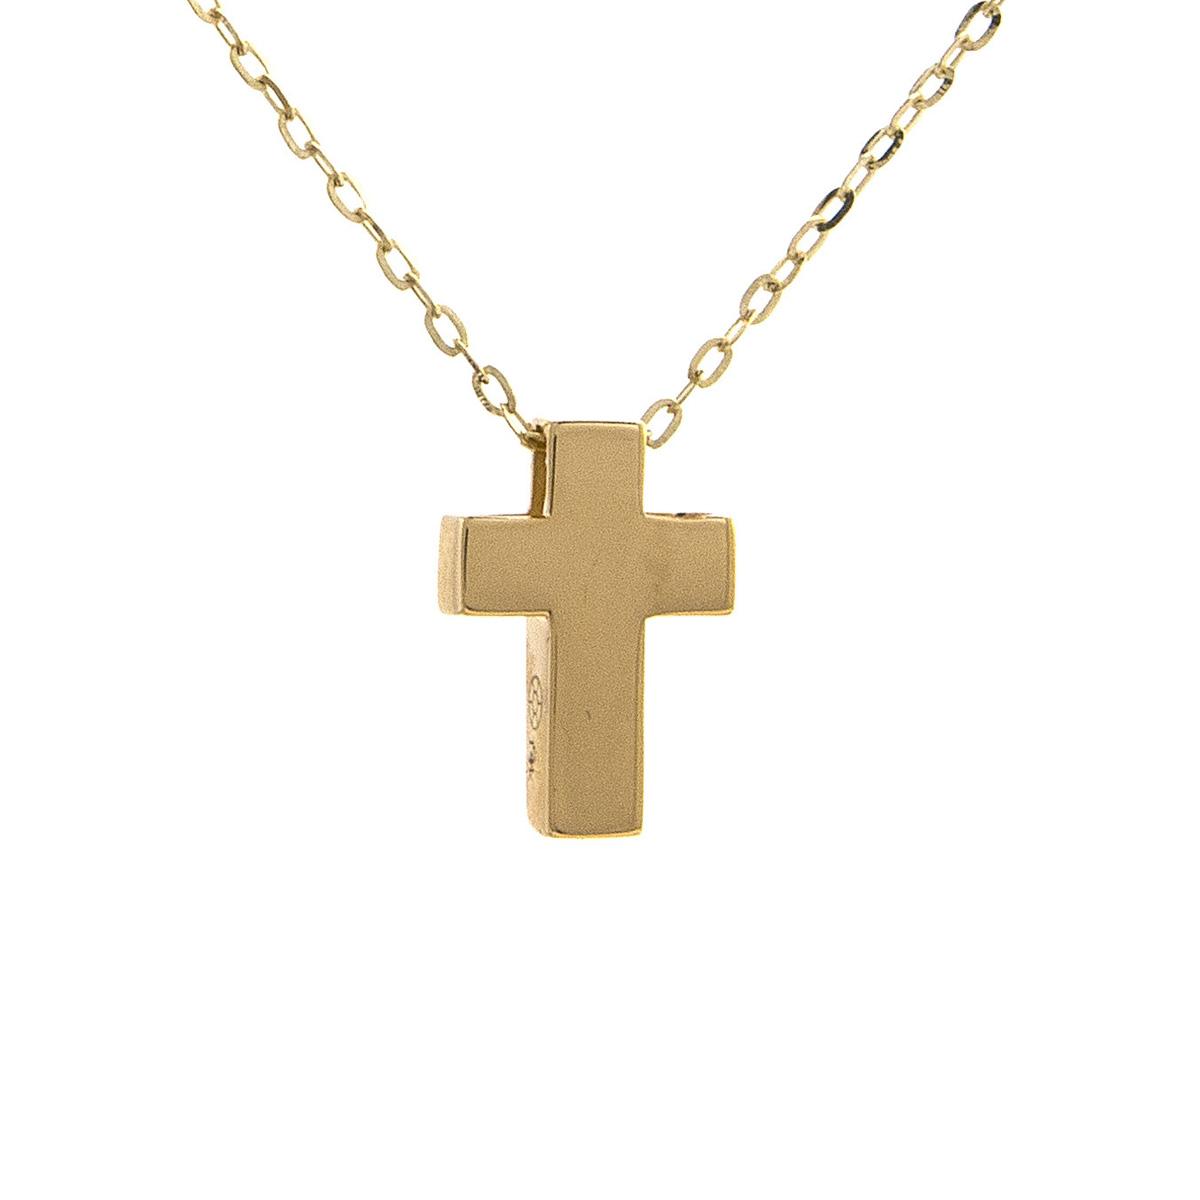 14 Karat Yellow Gold Cross Pendant Necklace